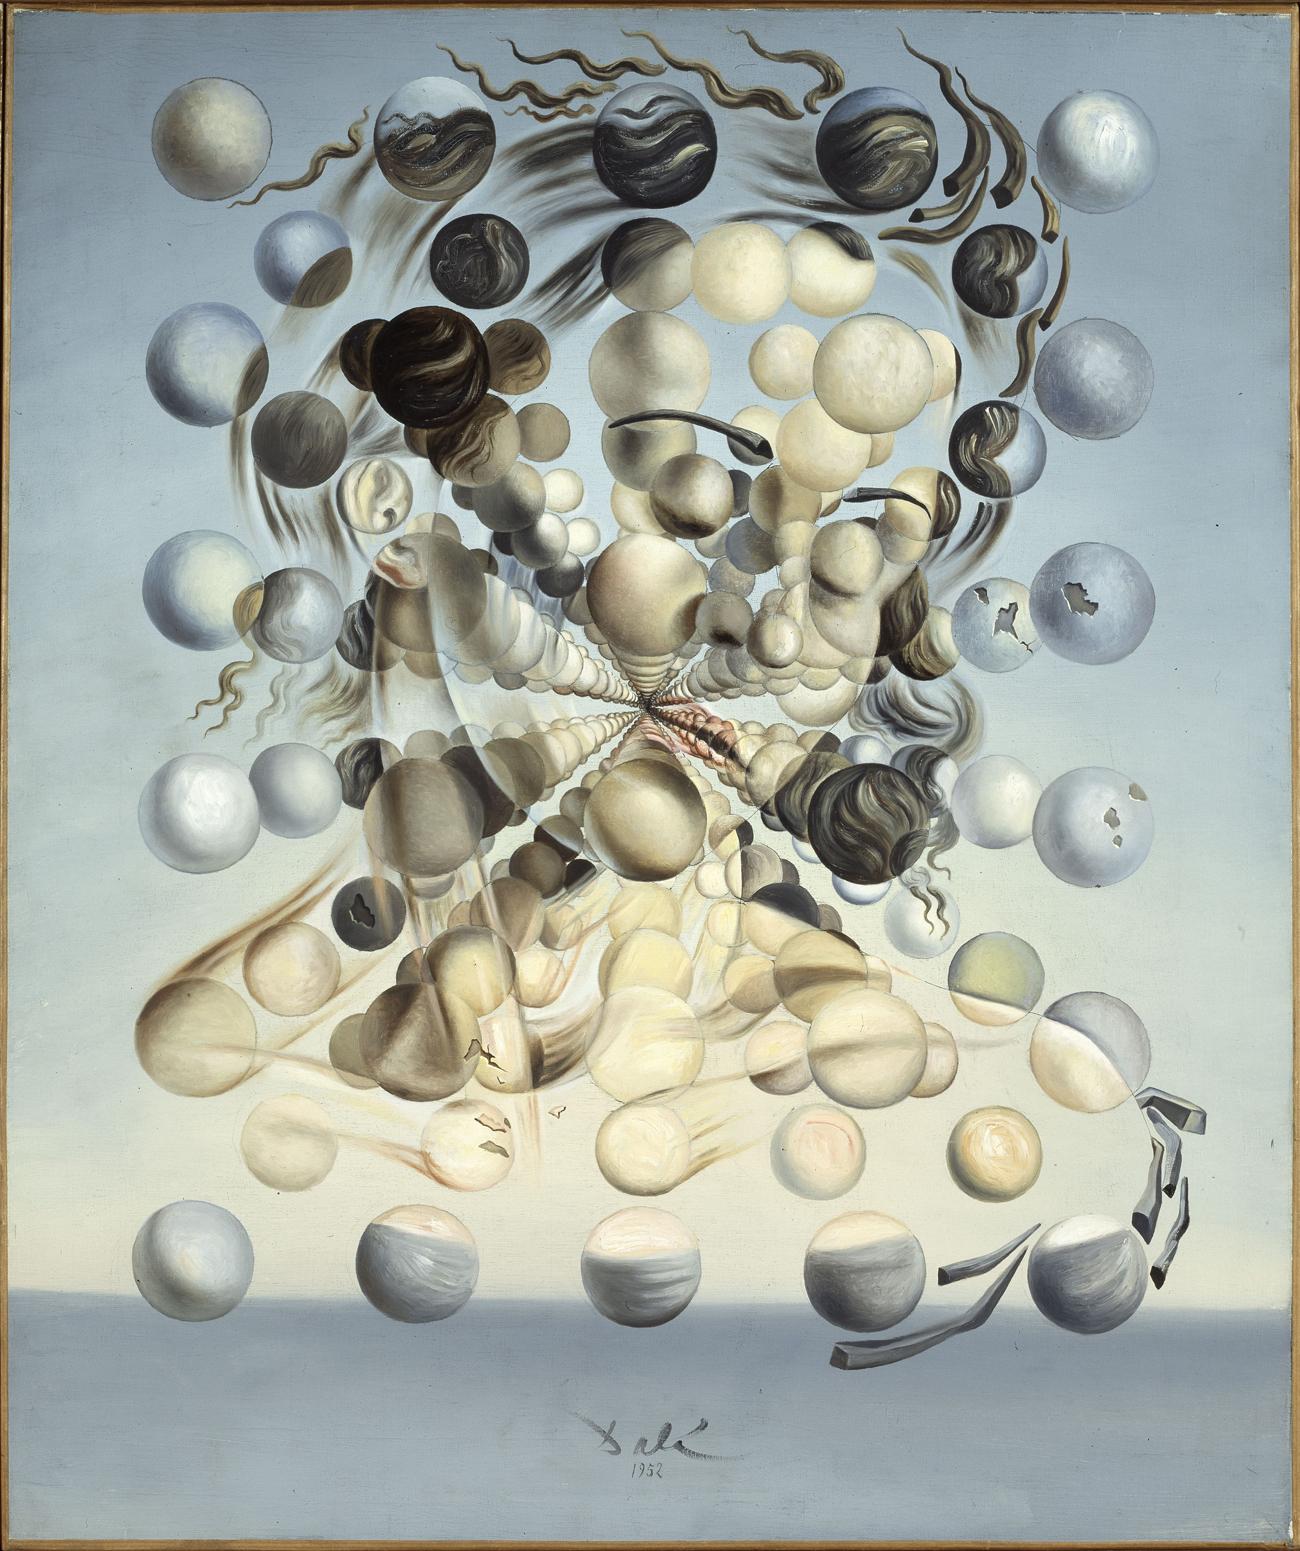 Сальвадор Дали. Gala Placidia. Галатея сфер.1952. Холст, масло. 65 × 54 см. Фонд «Гала — Сальвадор Дали» / © Salvador Dalí, Fundació Gala-Salvador Dalí